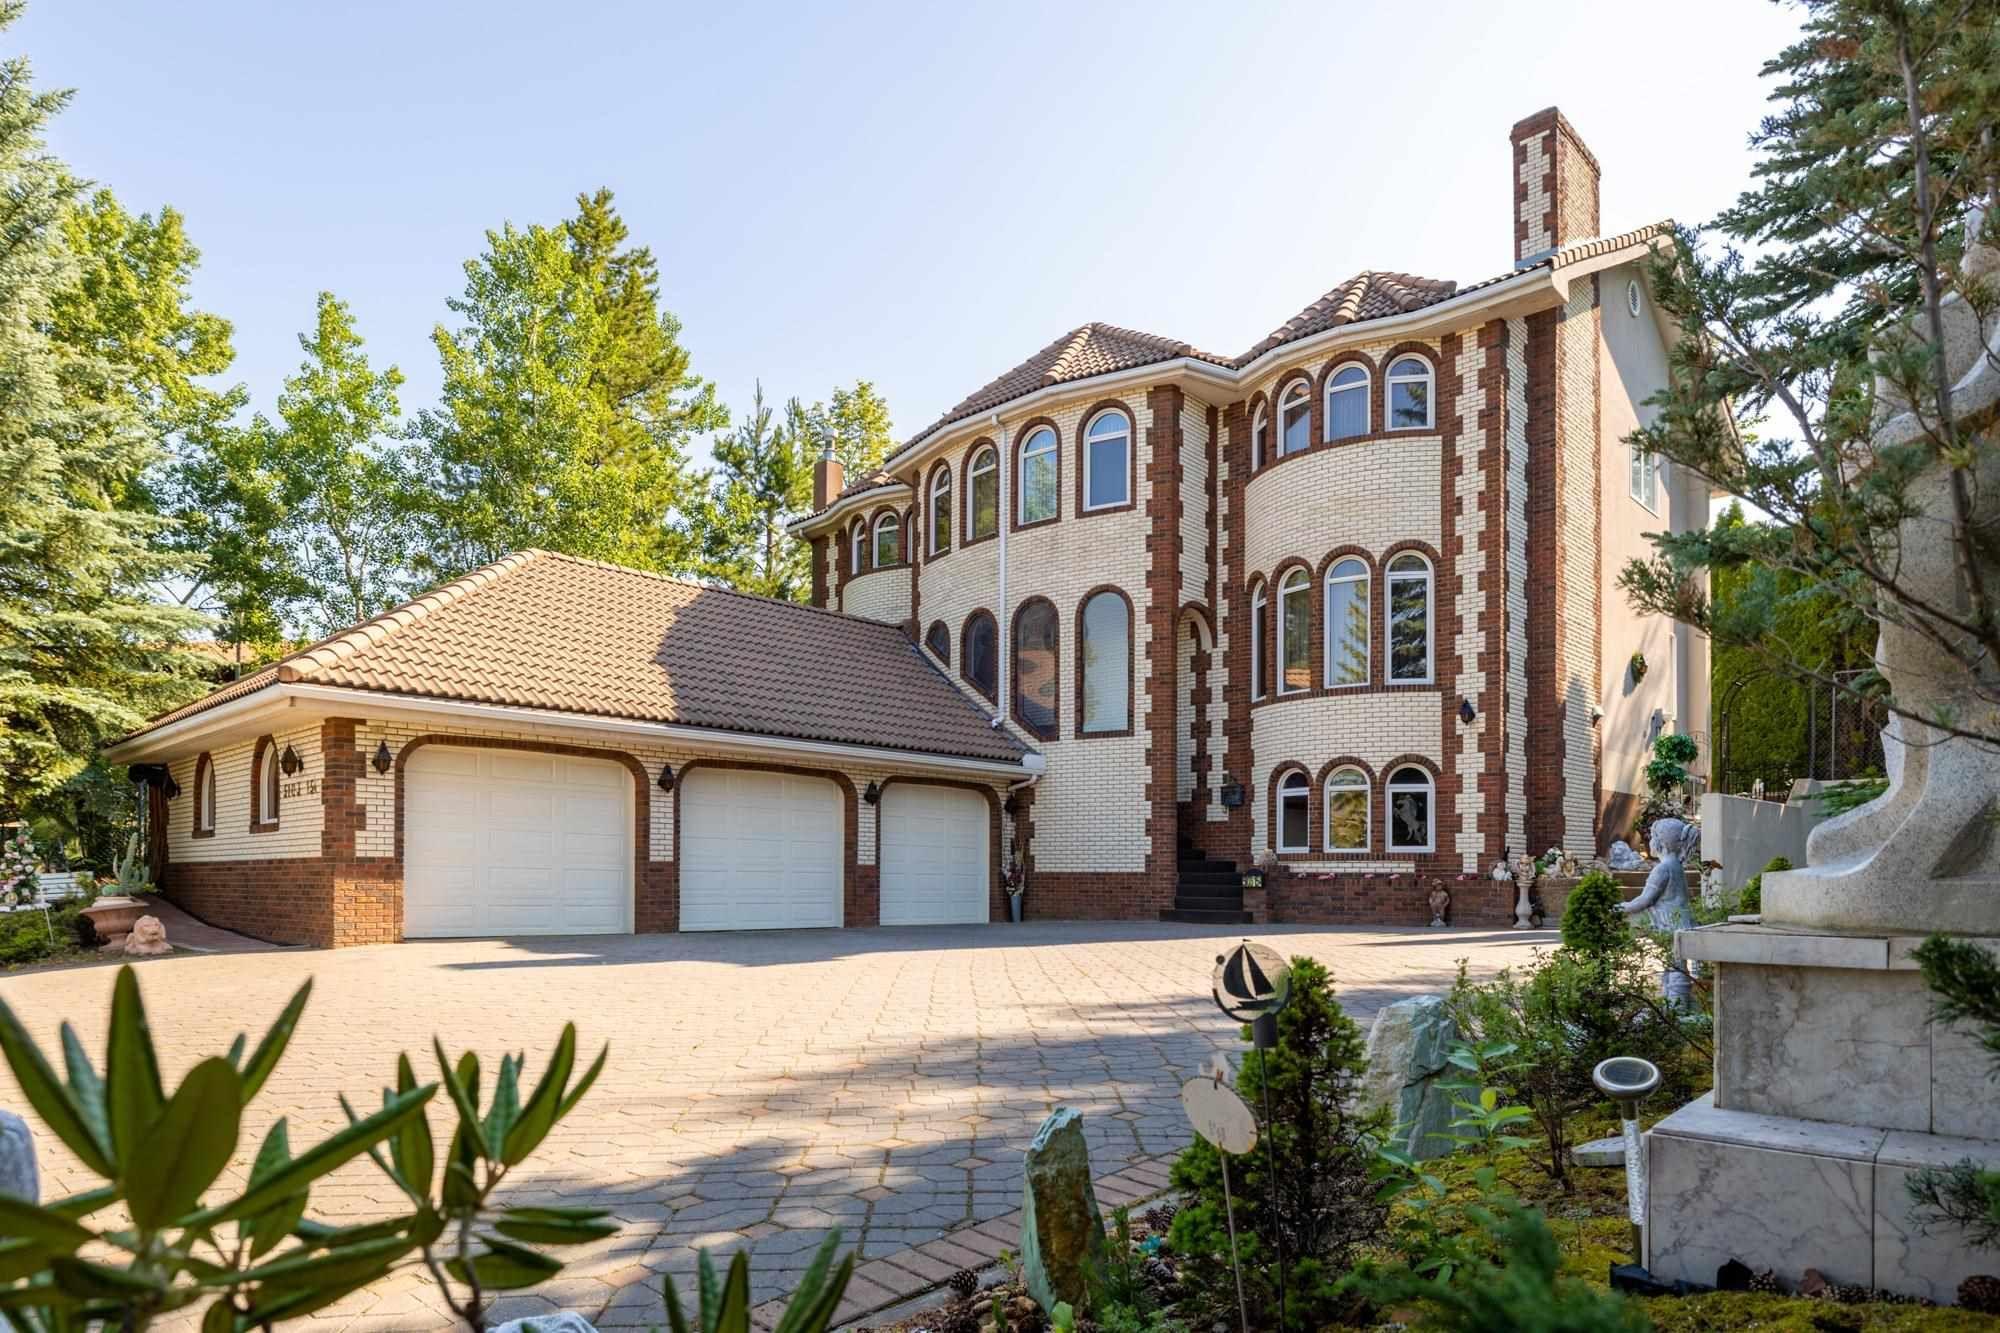 Main Photo: 5103 154 Street in Edmonton: Zone 14 House for sale : MLS®# E4261585